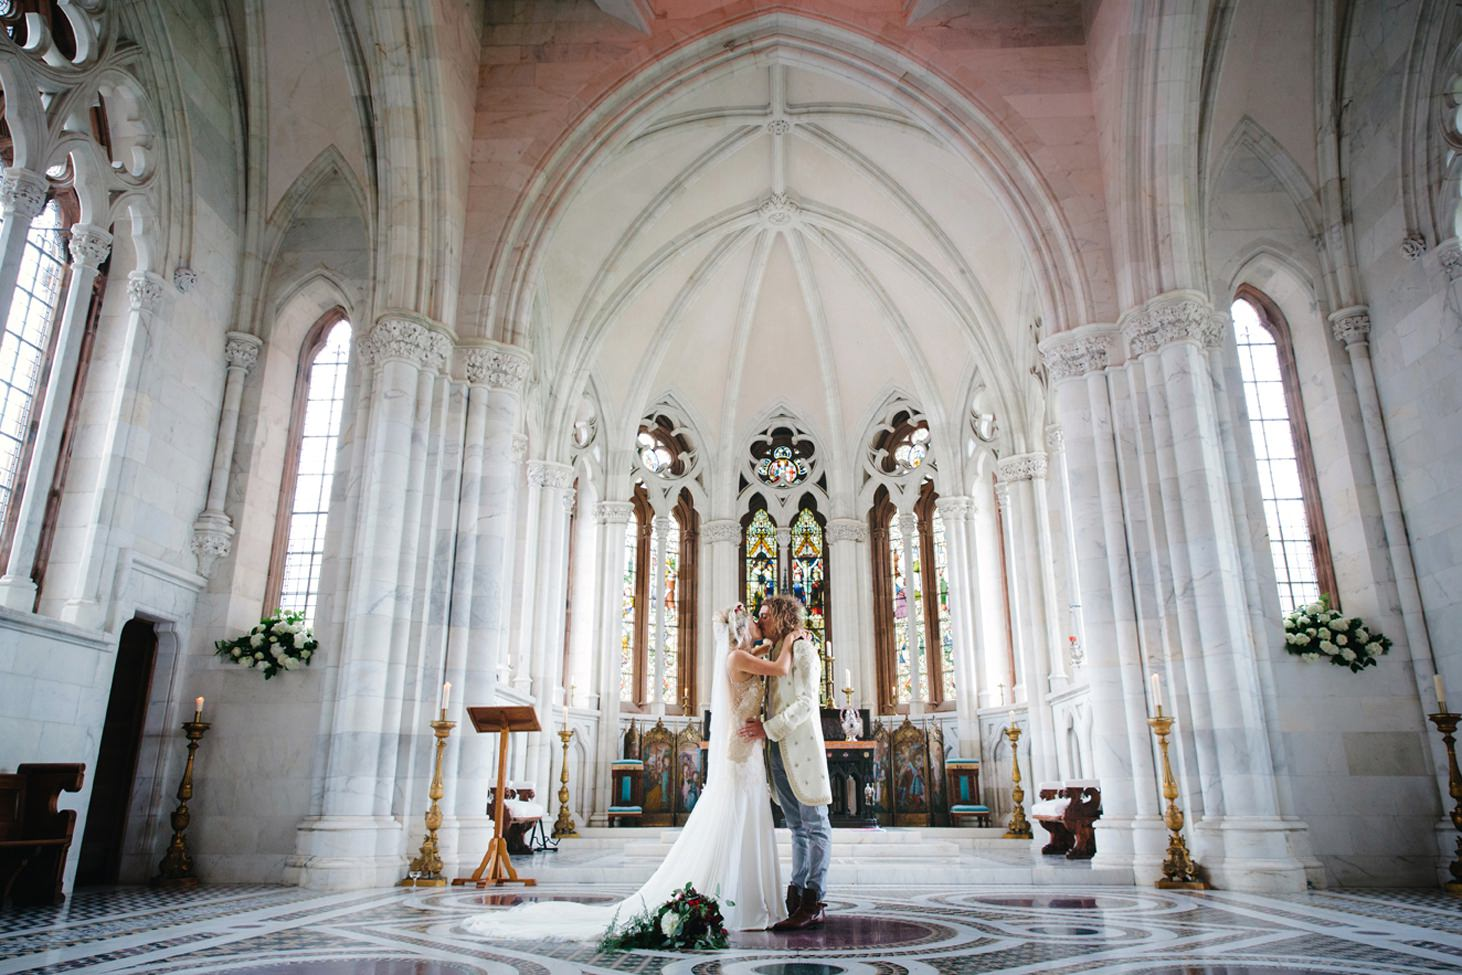 mount stuart wedding photography able chapel bride and groom